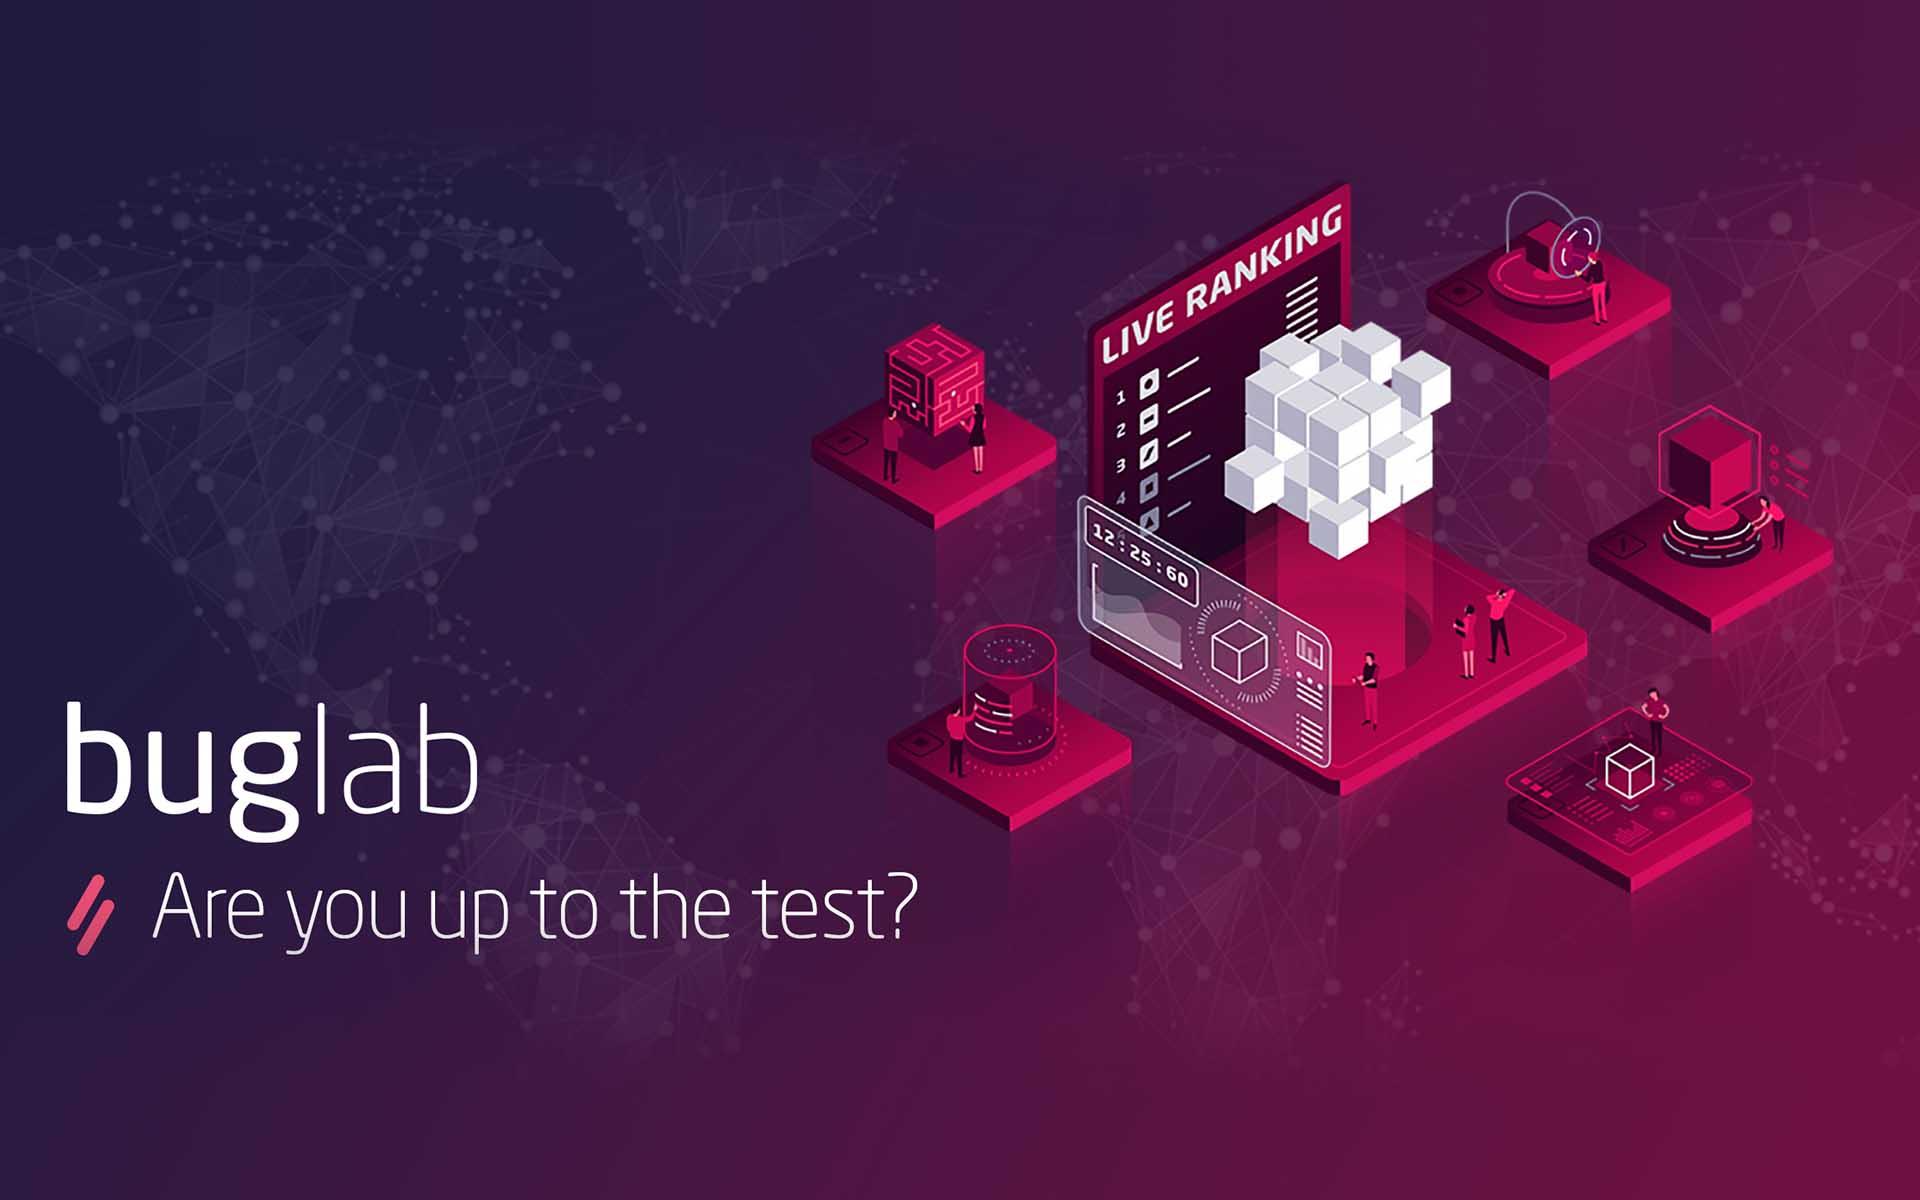 Buglab: Delivering Unprecedented Cybersecurity Through Blockchain Technology